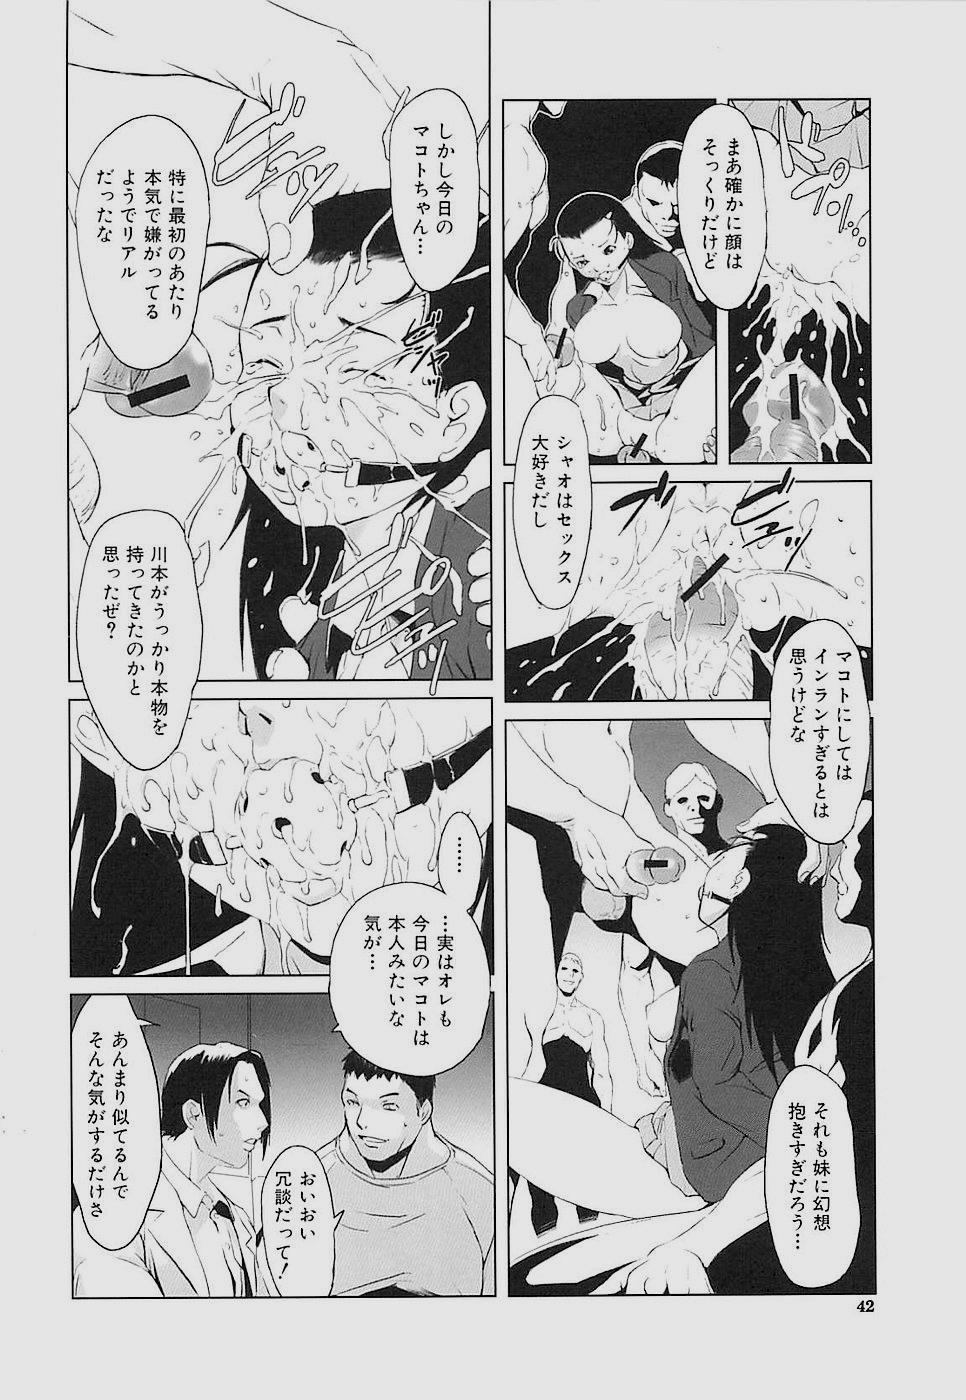 Inkoukamitsu 43